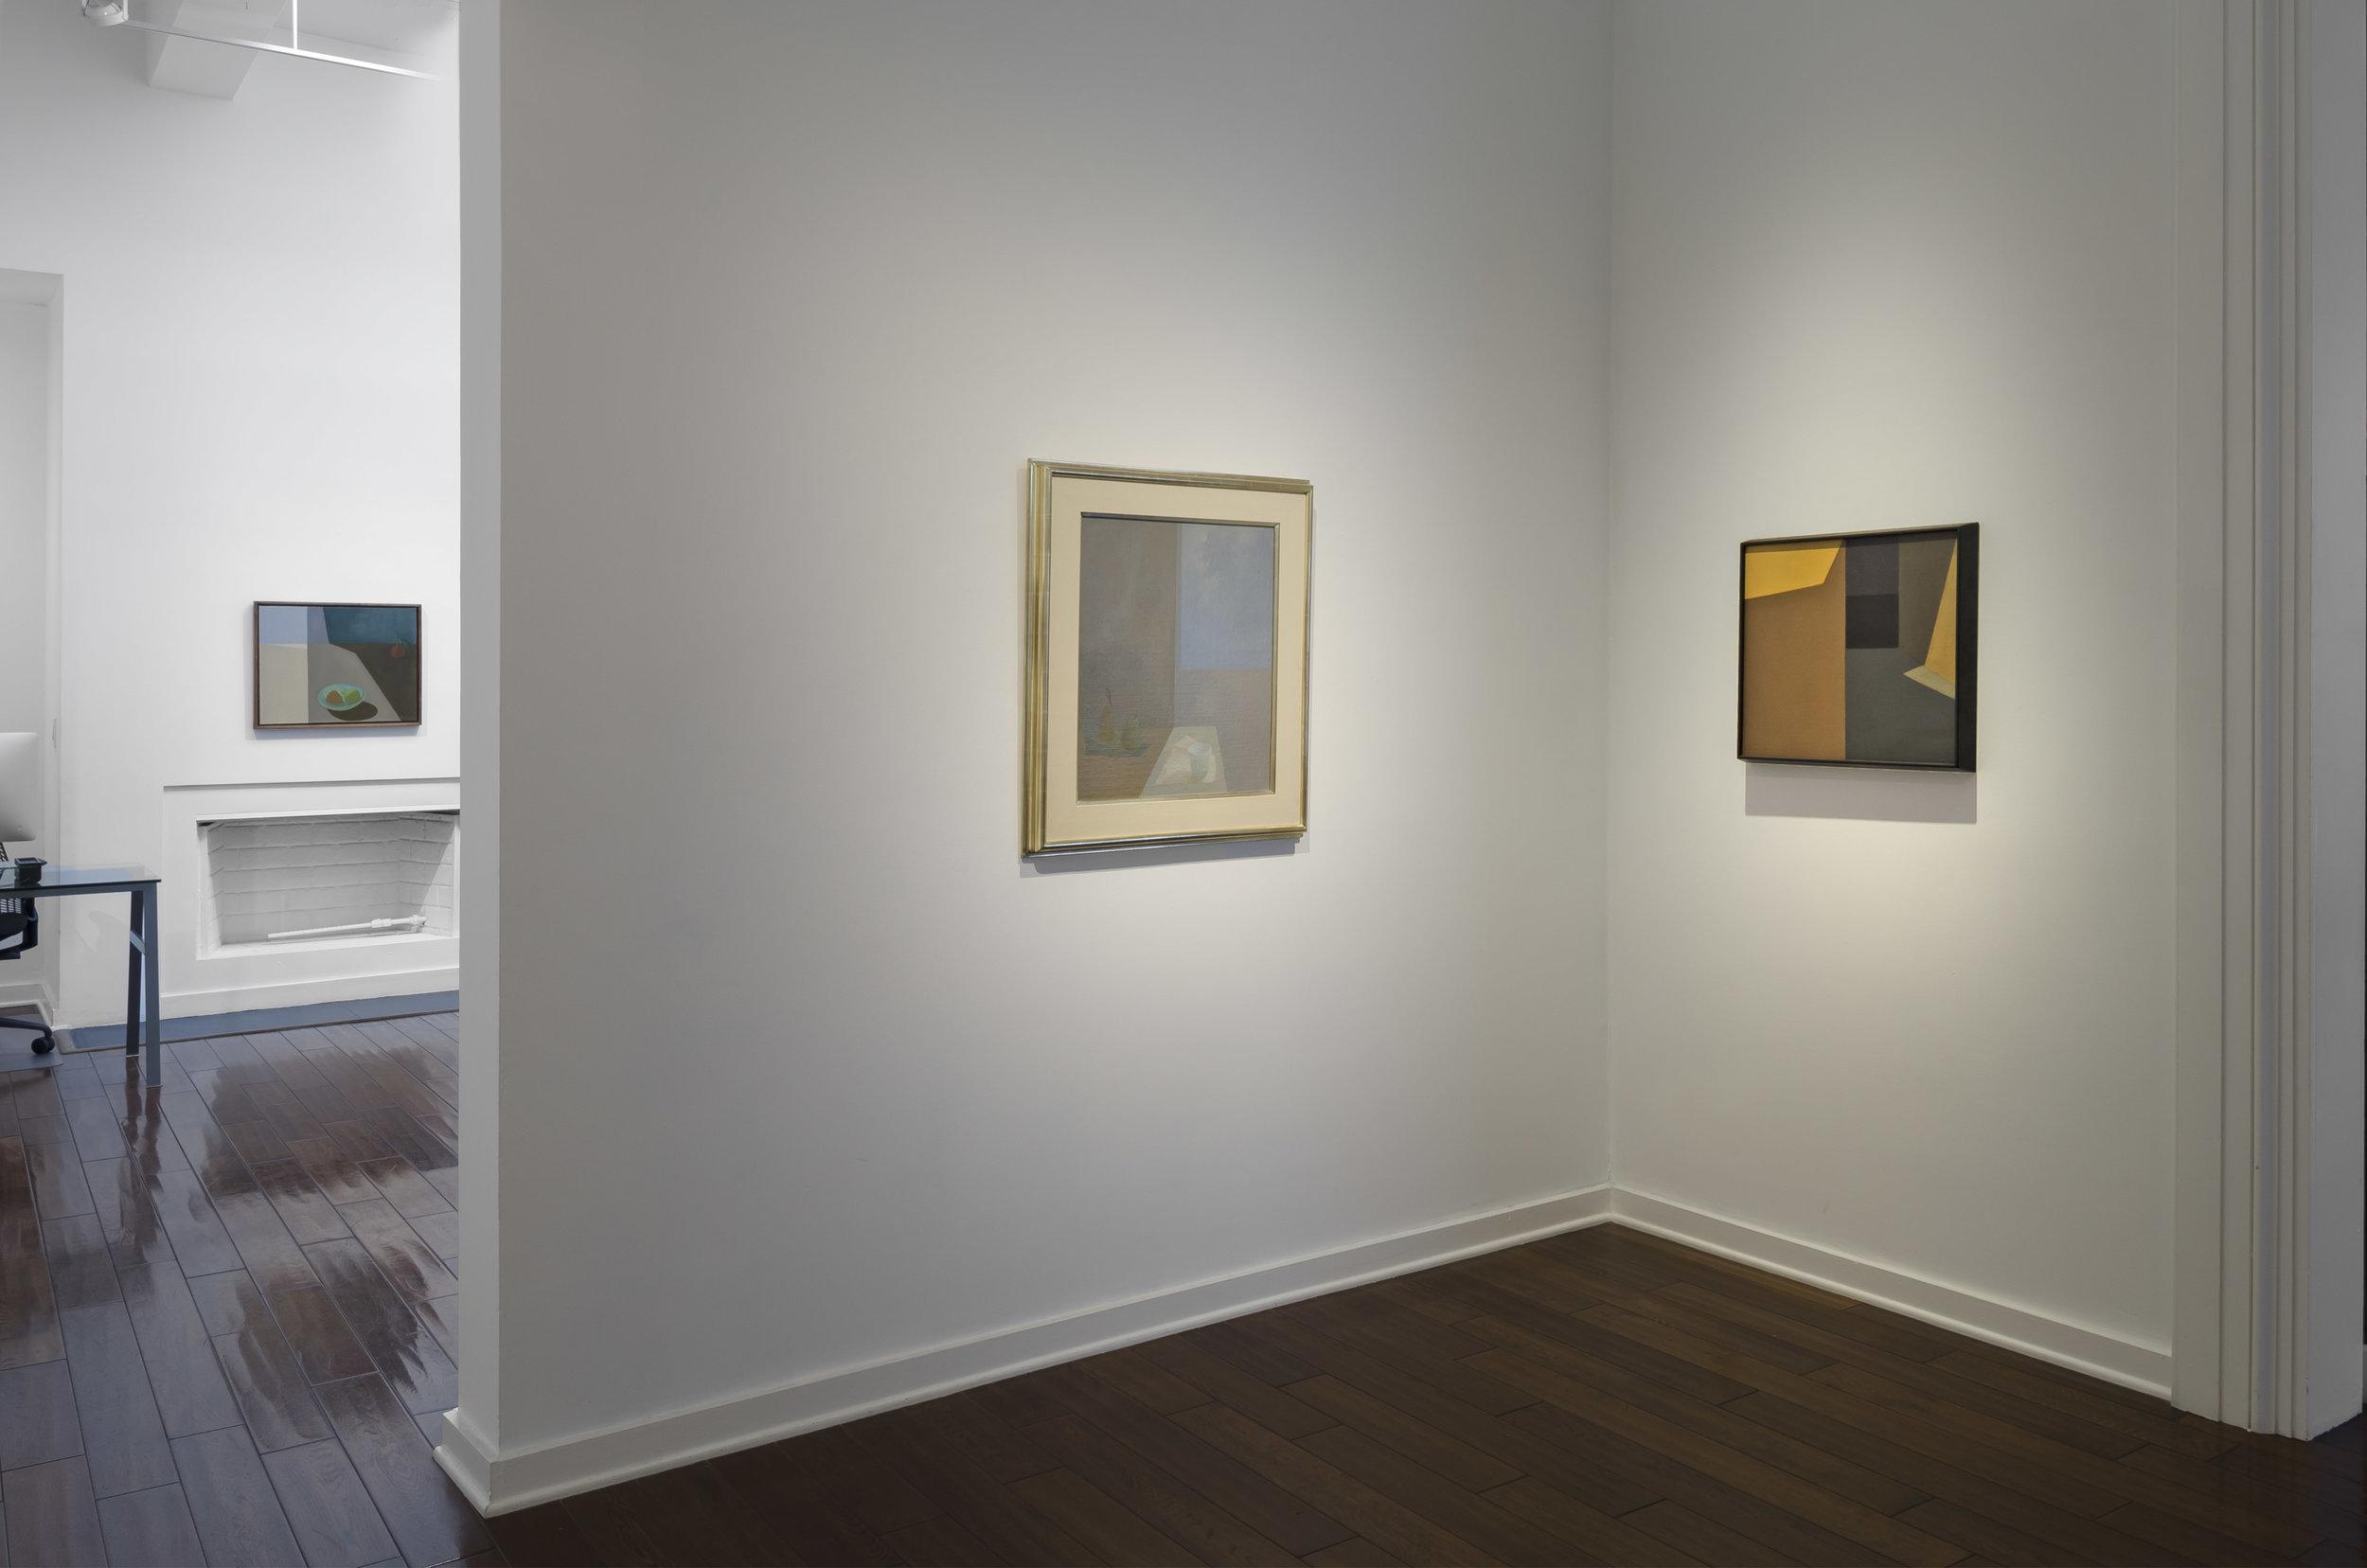 Helen Lundeberg: Interiors